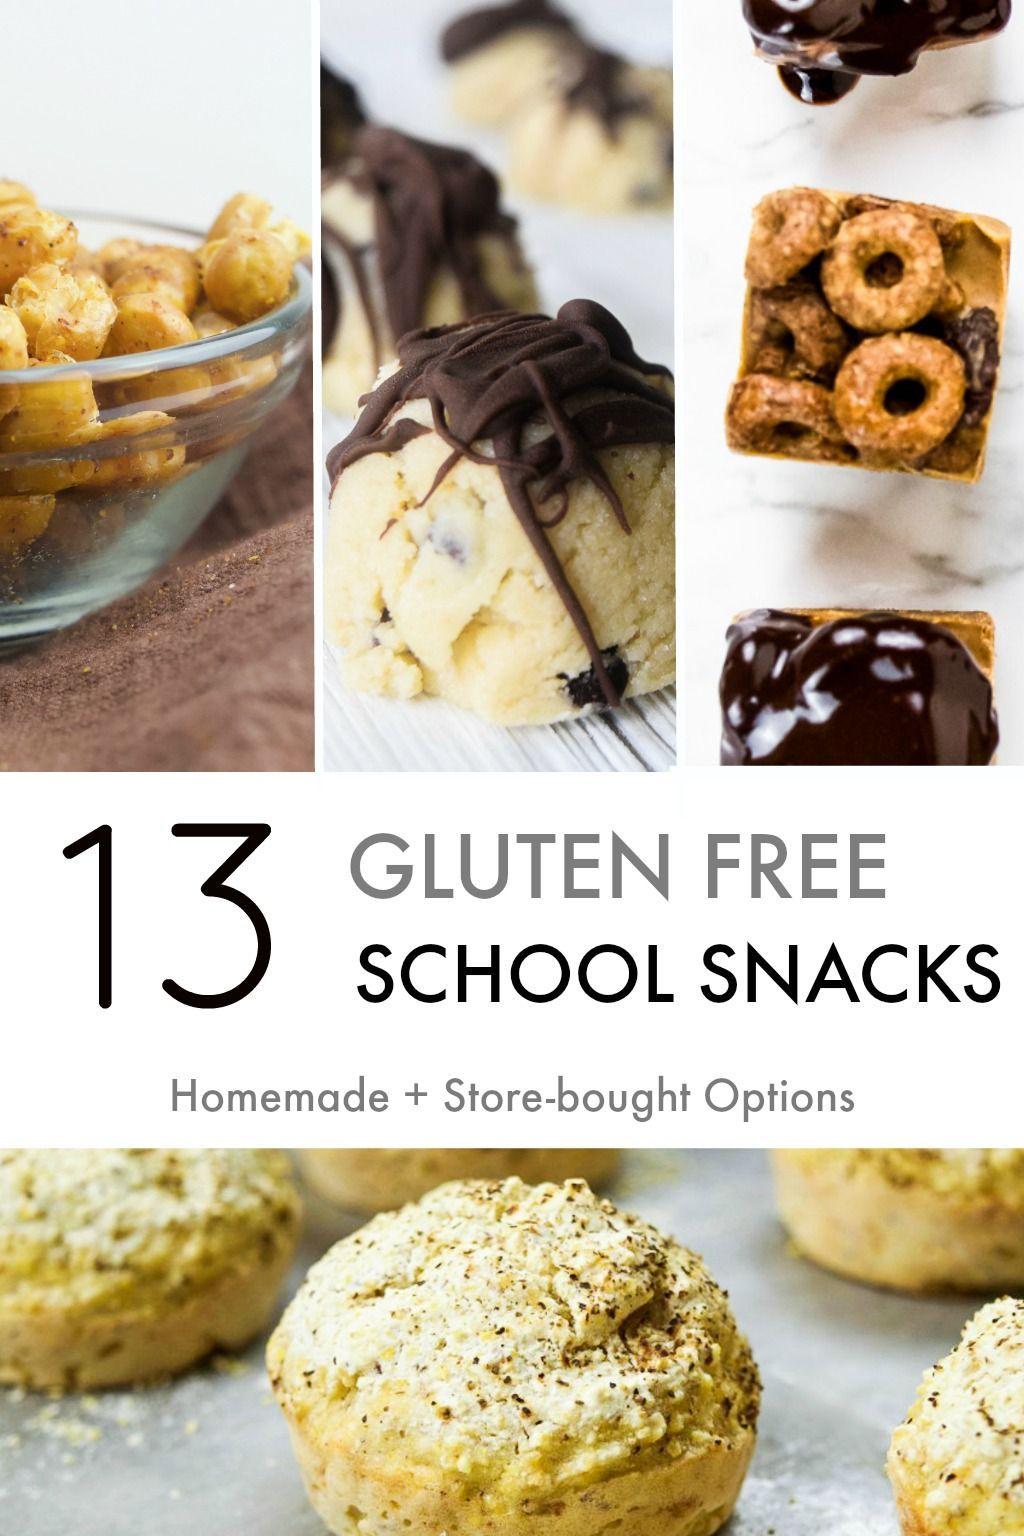 13 Gluten Free School Snacks (Homemade + Storebought